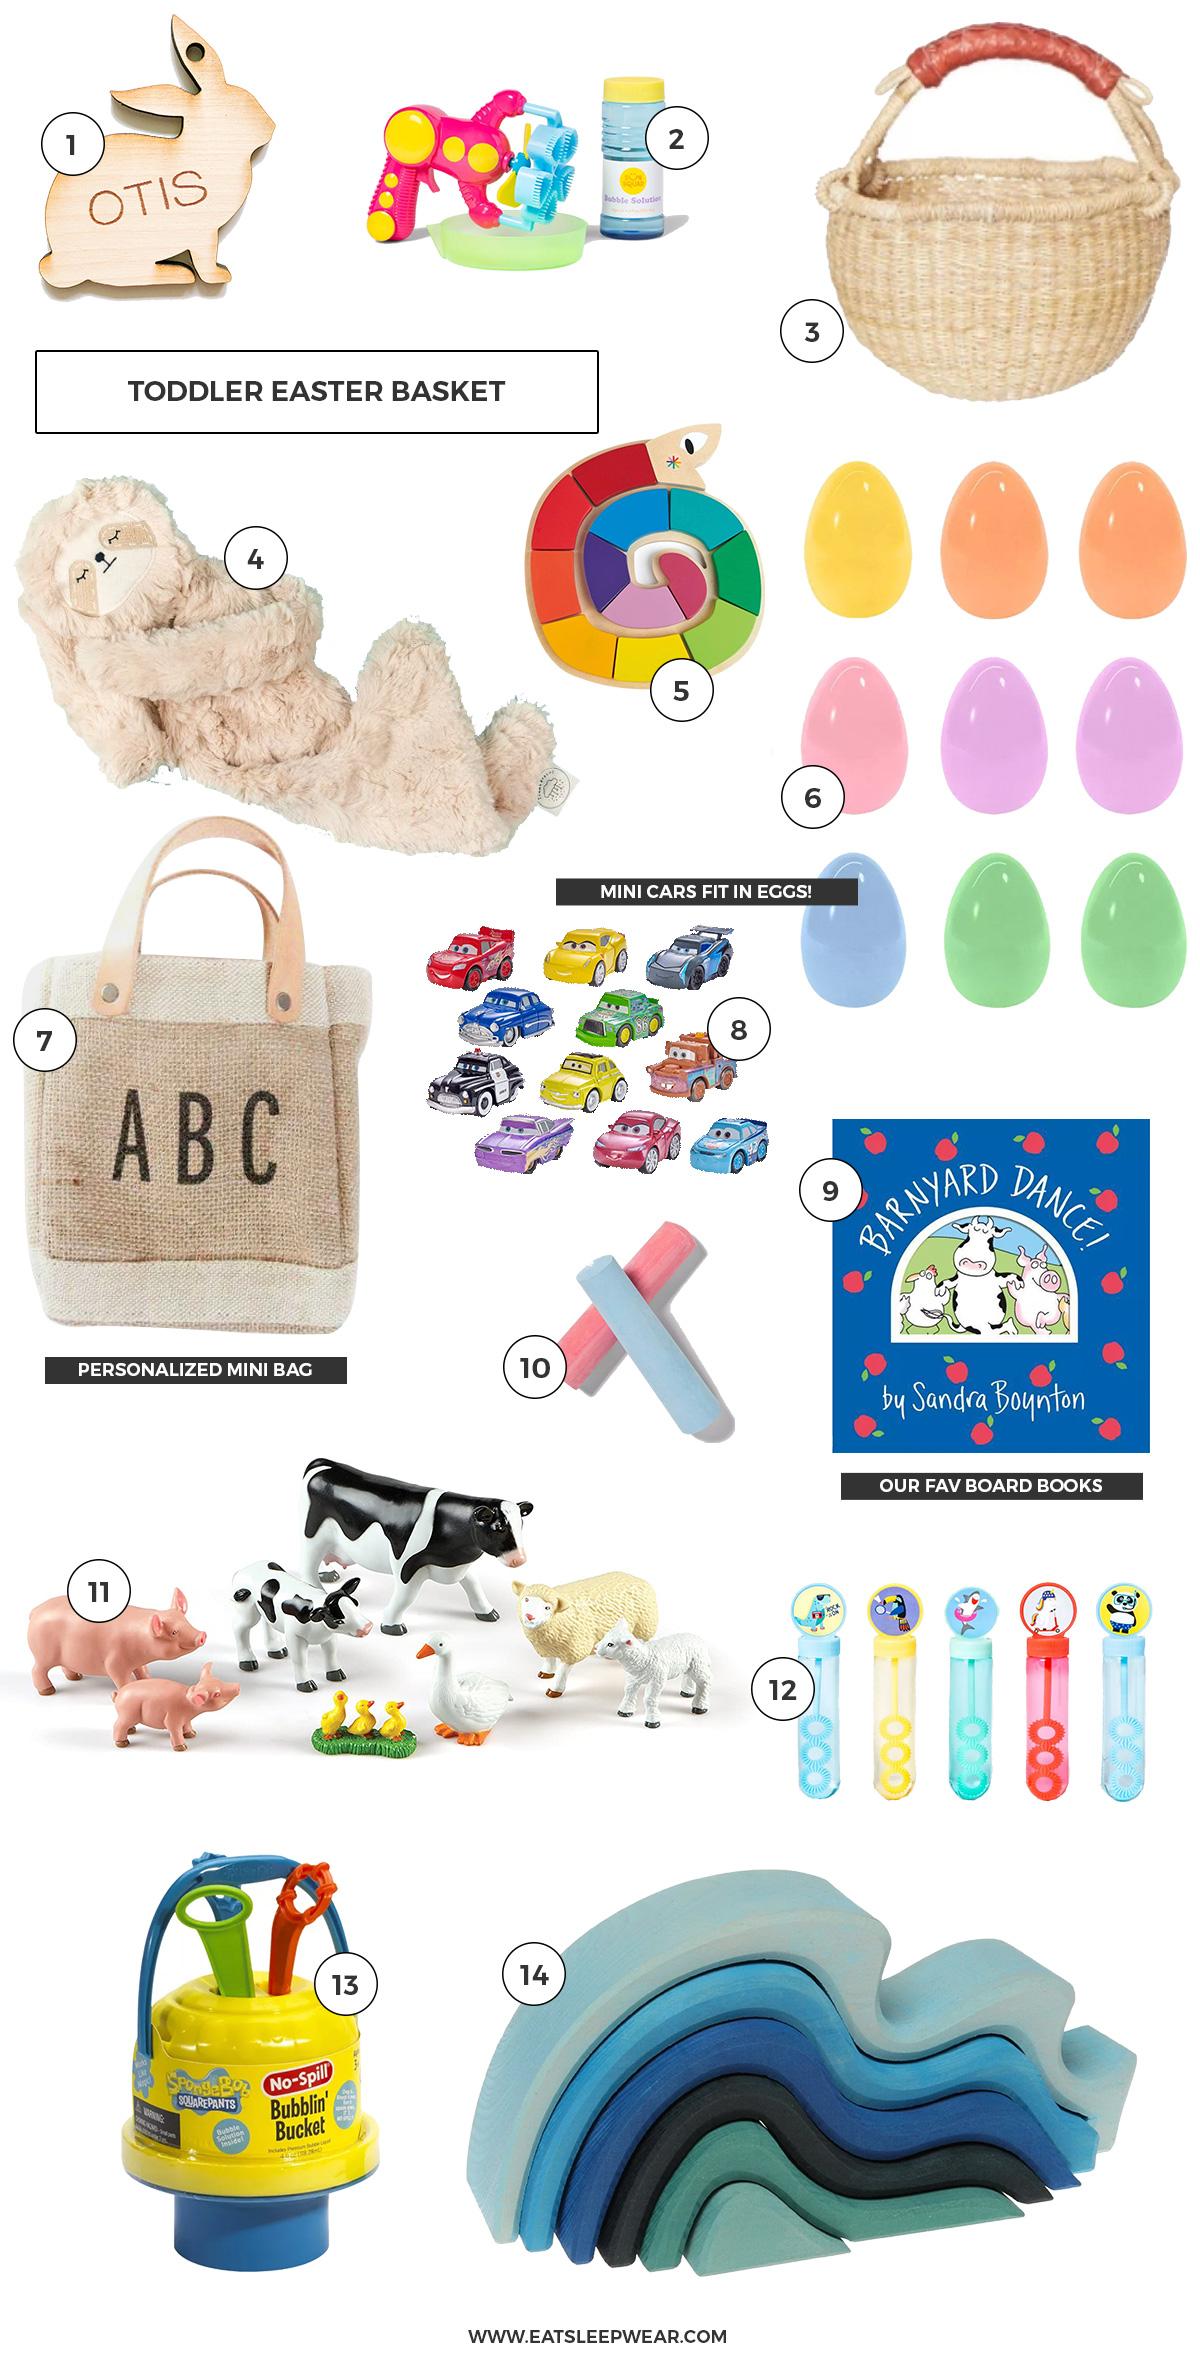 Toddler Easter Basket Essentials created by Kimberly Lapides of Eatsleepwear featuring bubbles, sidewalk chalk, sandra boynton books, slumberkins, the little market and poppyjack shop.